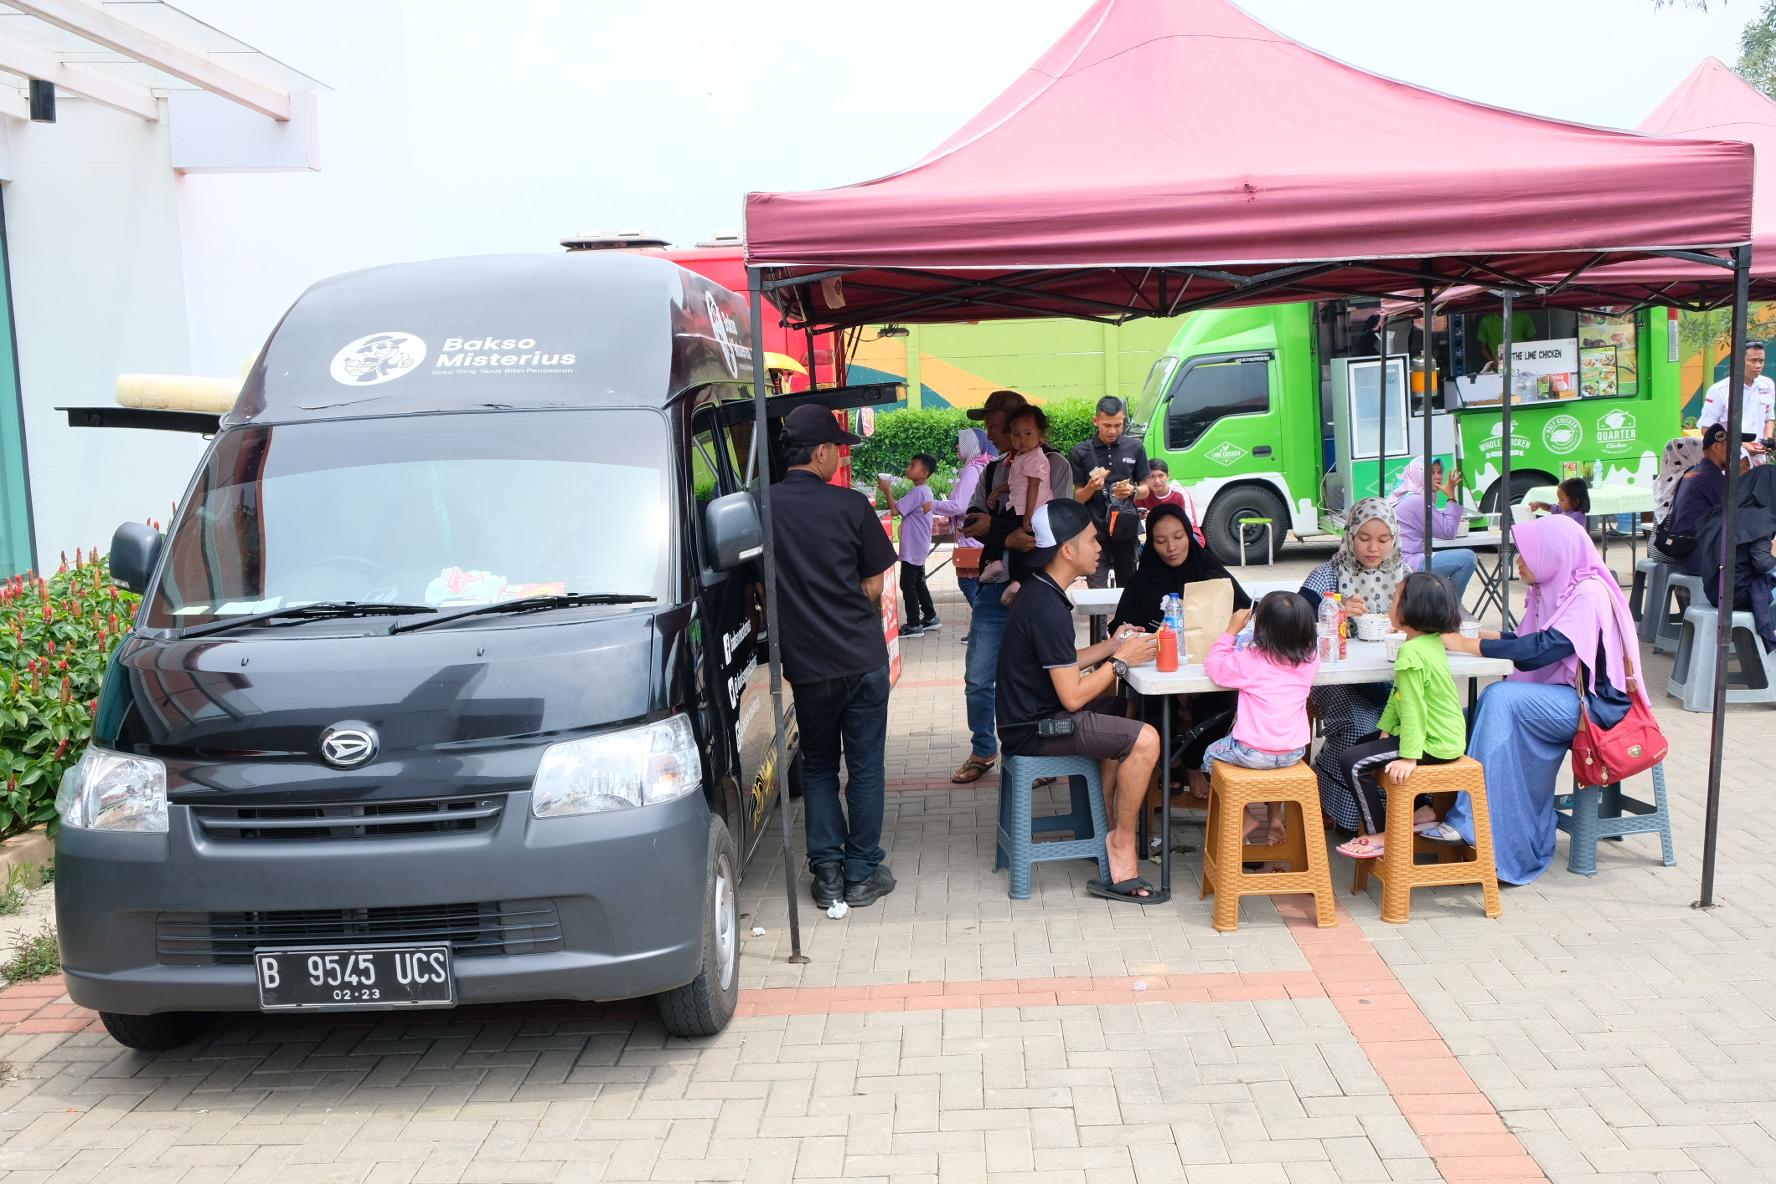 Serunya Bermain Bersama Keluarga Dalam Acara Family Fun Day di SEKAR